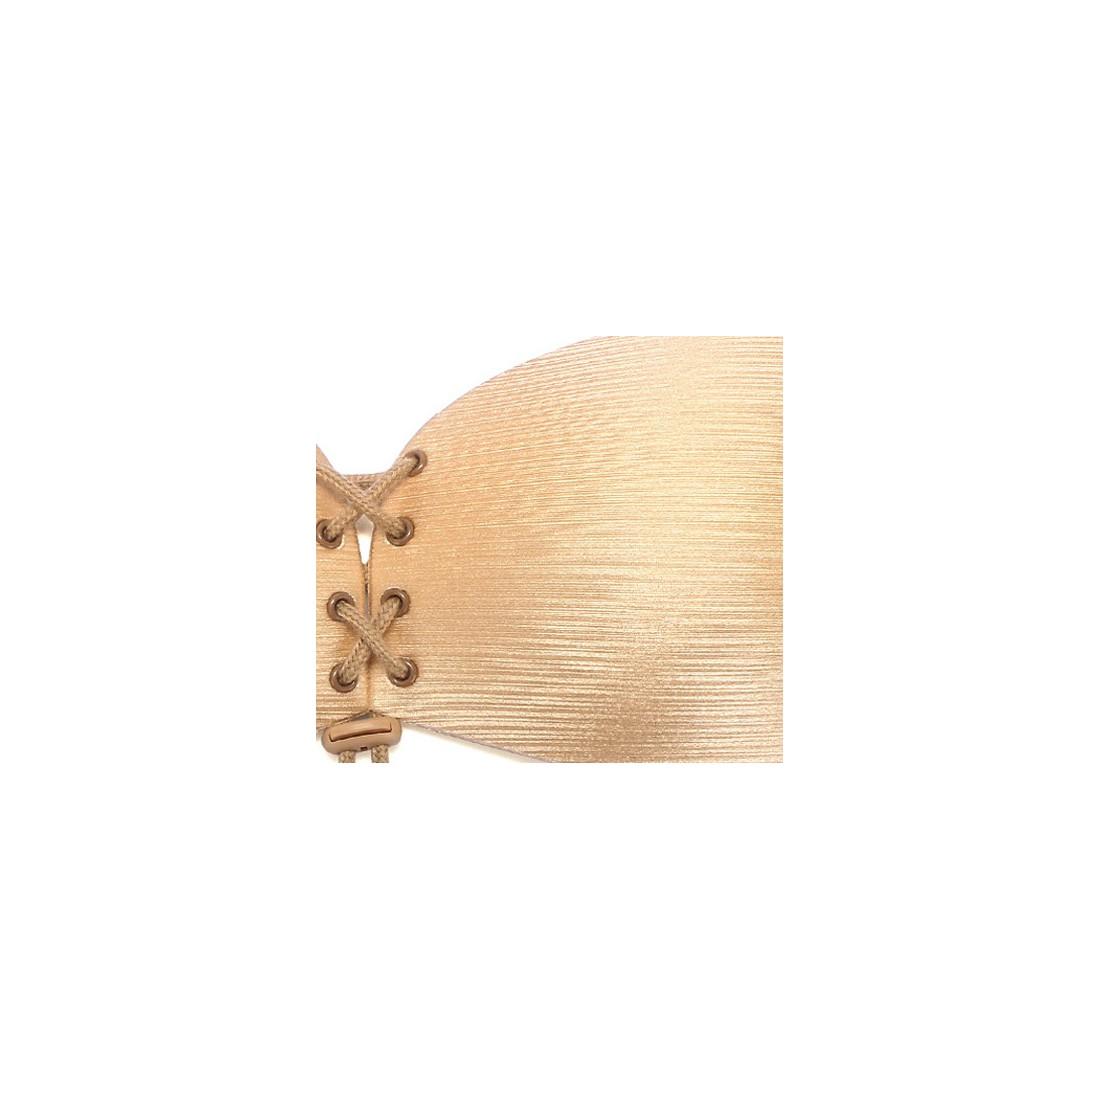 06084e66e1 Luxury Push-Up Stick On Bra - Classic Nude Boost™